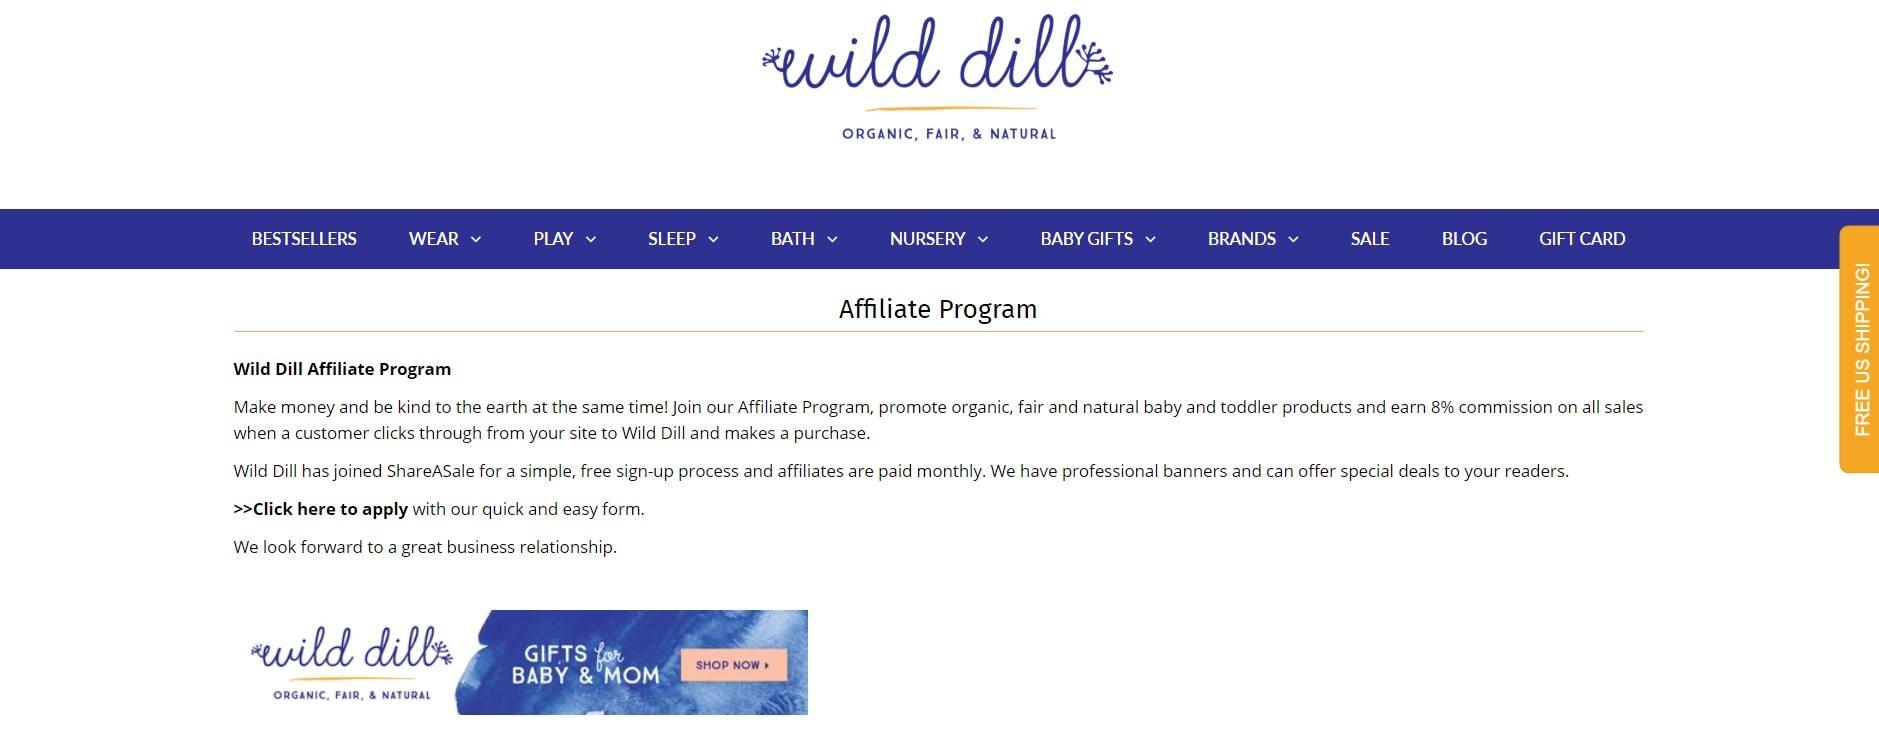 WildDill Affiliate Program